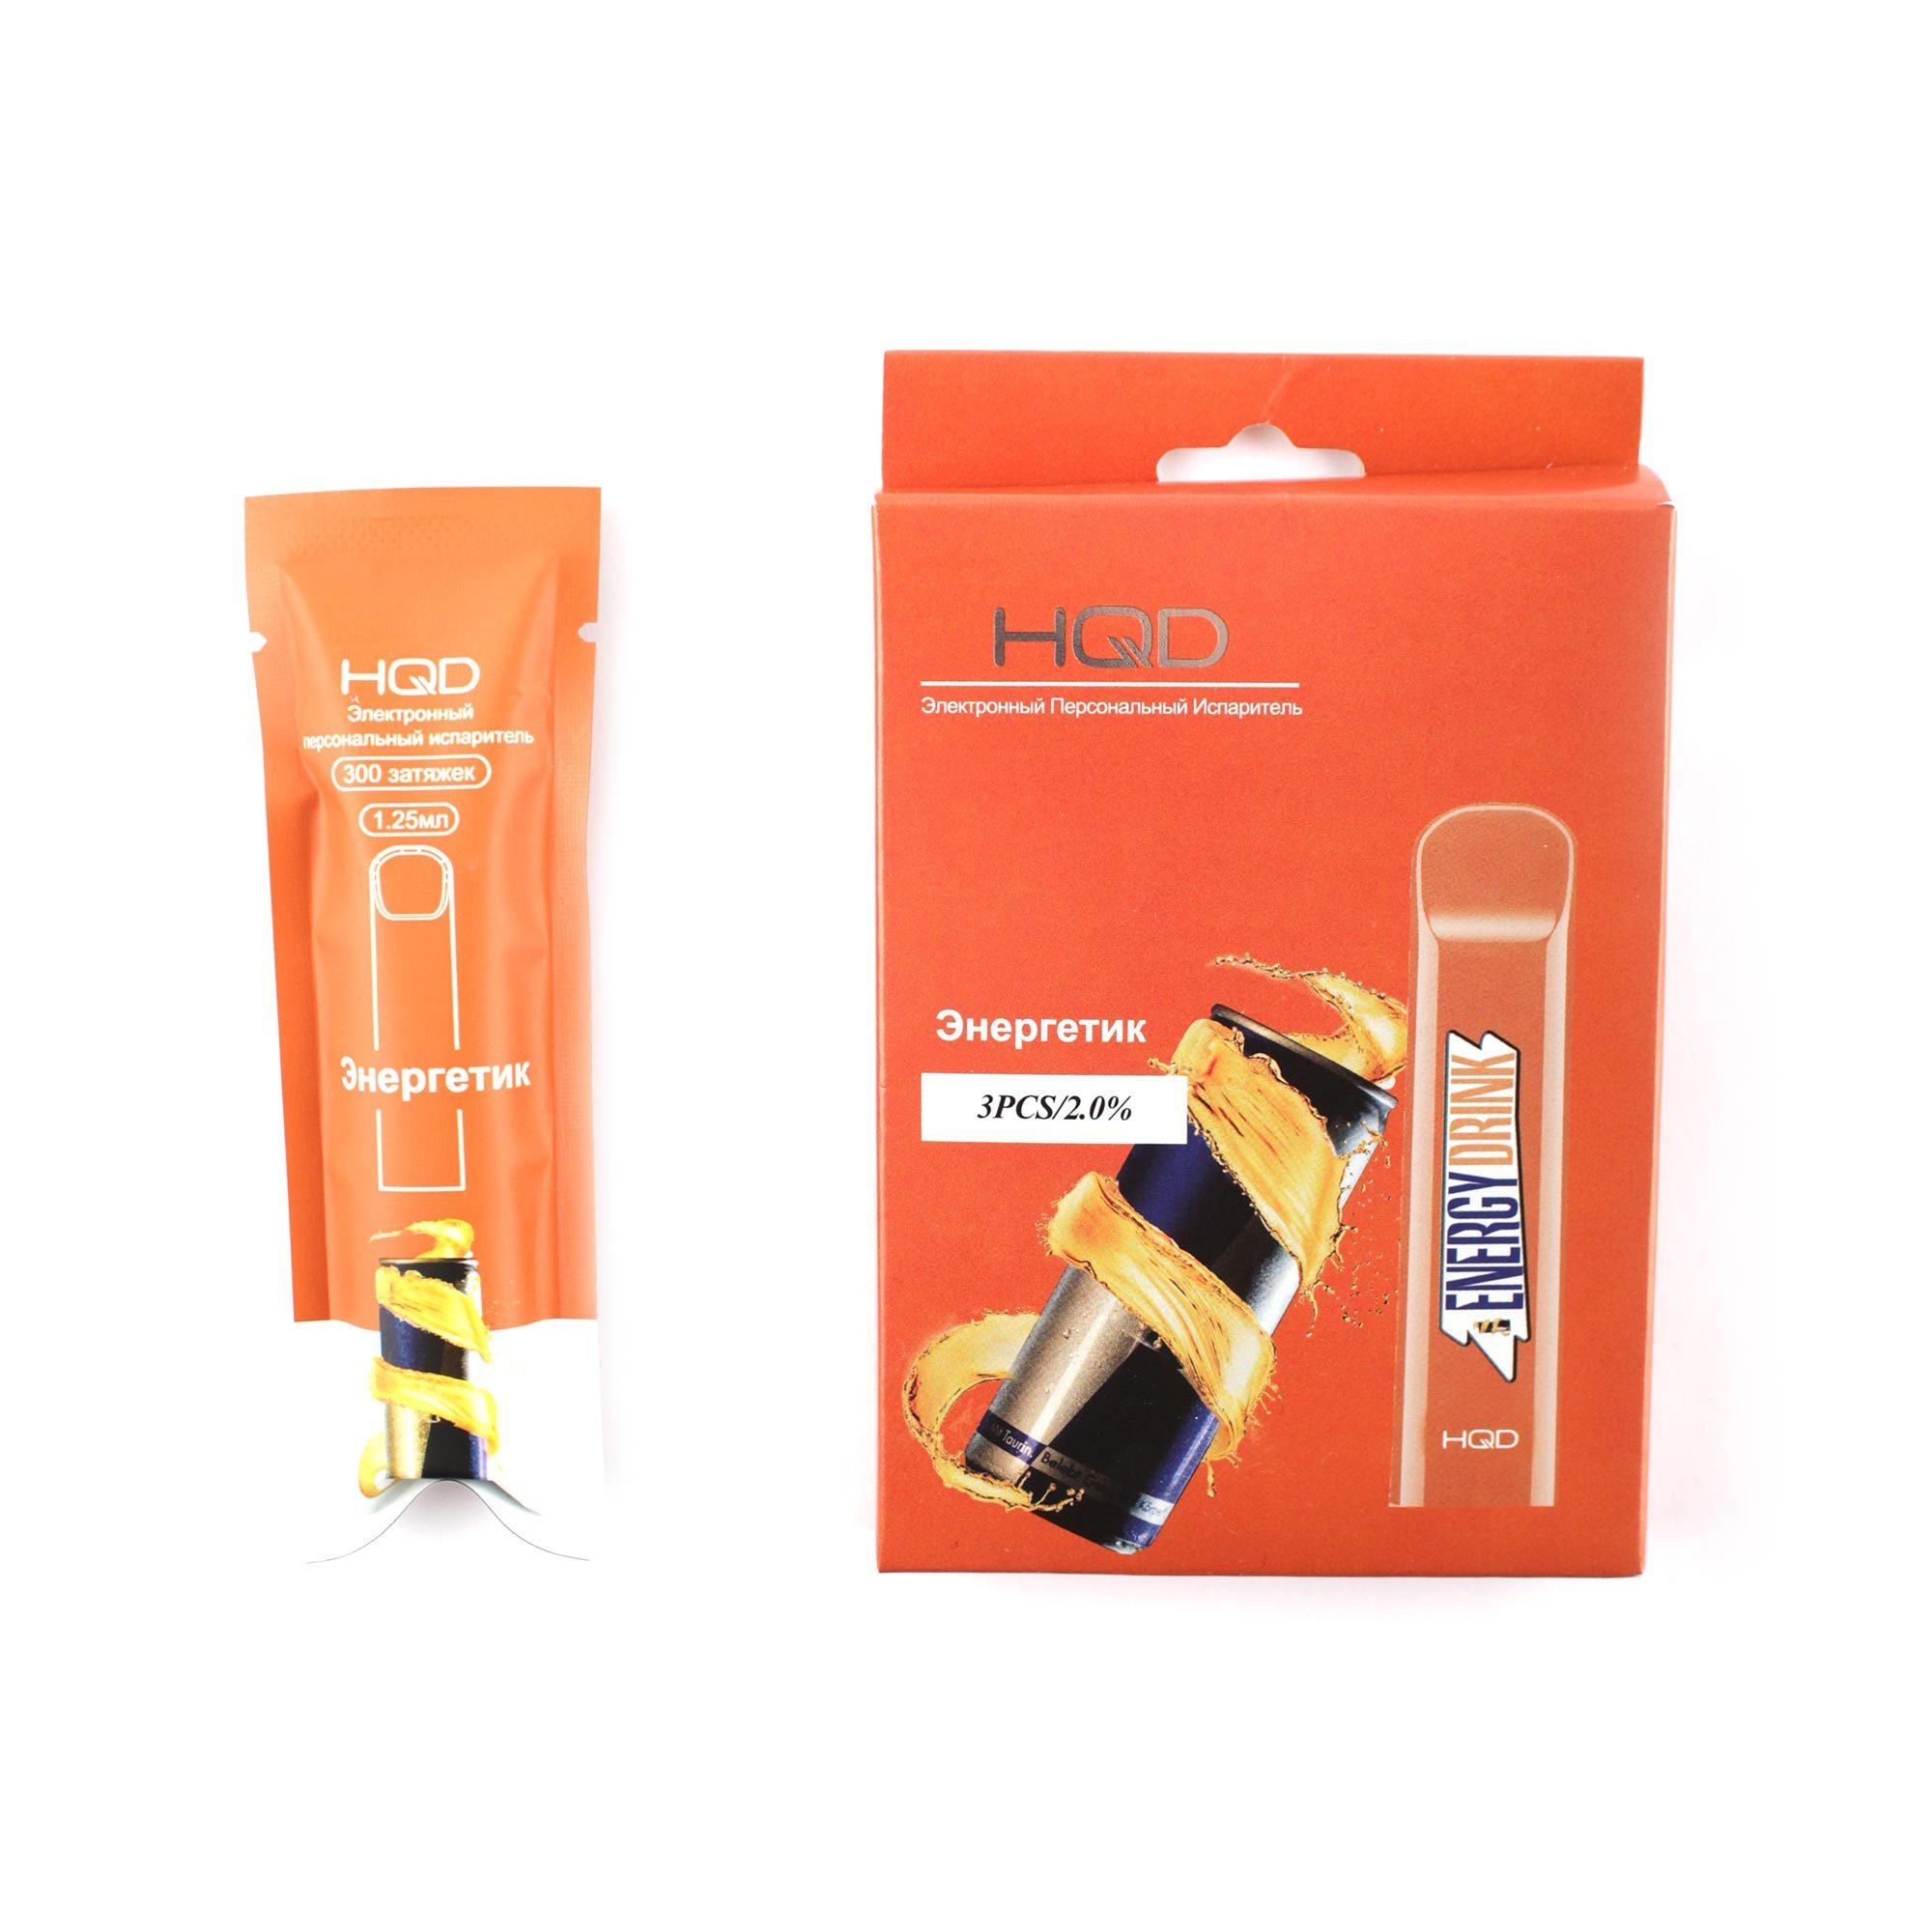 Одноразовая электронная сигарета HQD Energy (Энергетик)